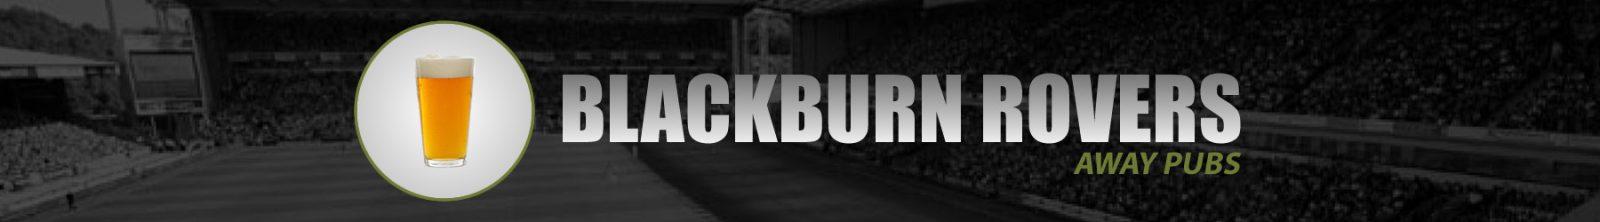 Blackburn Rovers Away Pubs